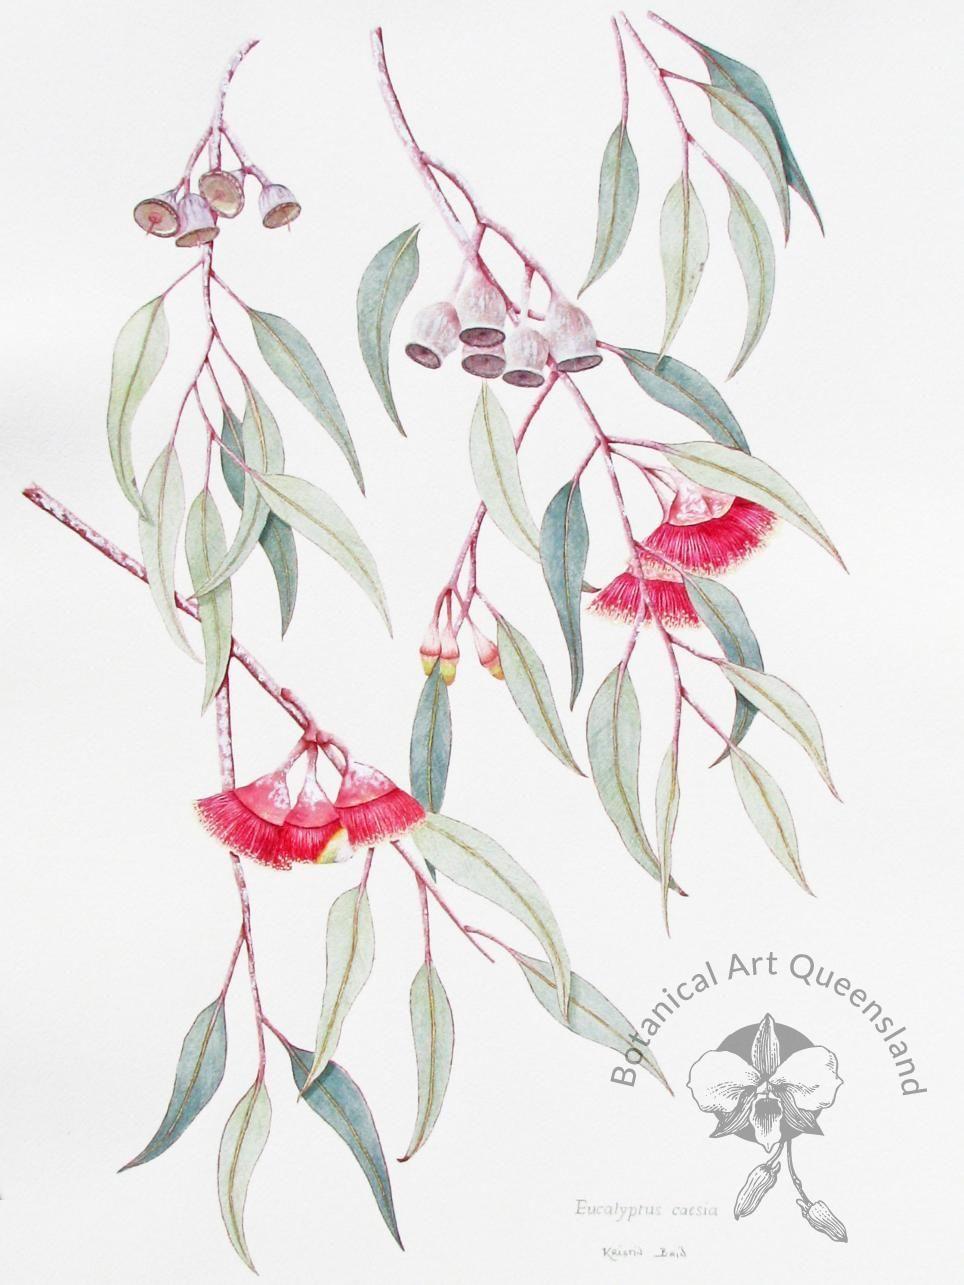 Kristin Bain Eucalyptus Caesia Watercolour And Gouache Basq